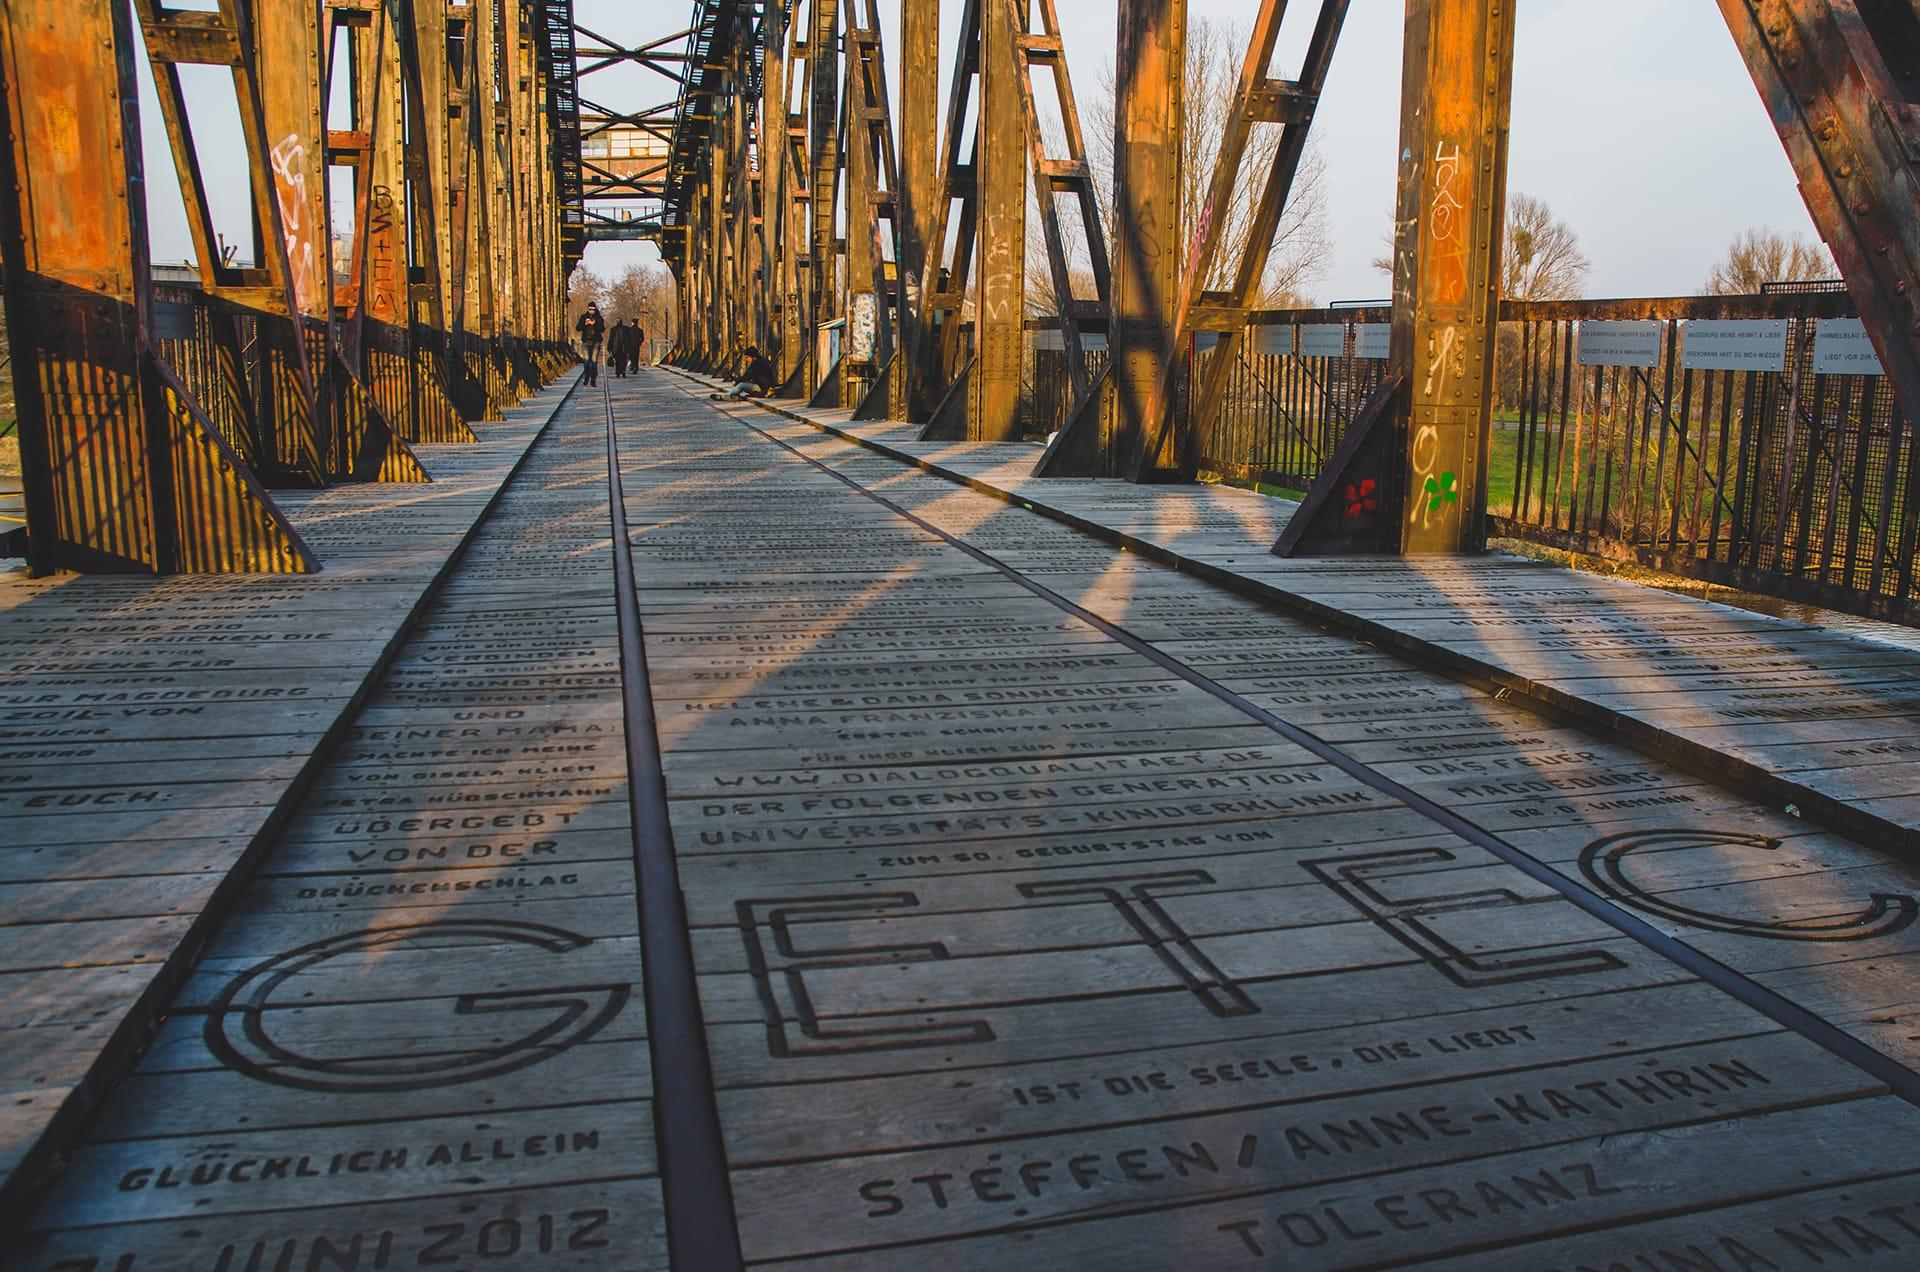 Magdeburg Elbbahnhof Hubbrücke Rolf Onnen